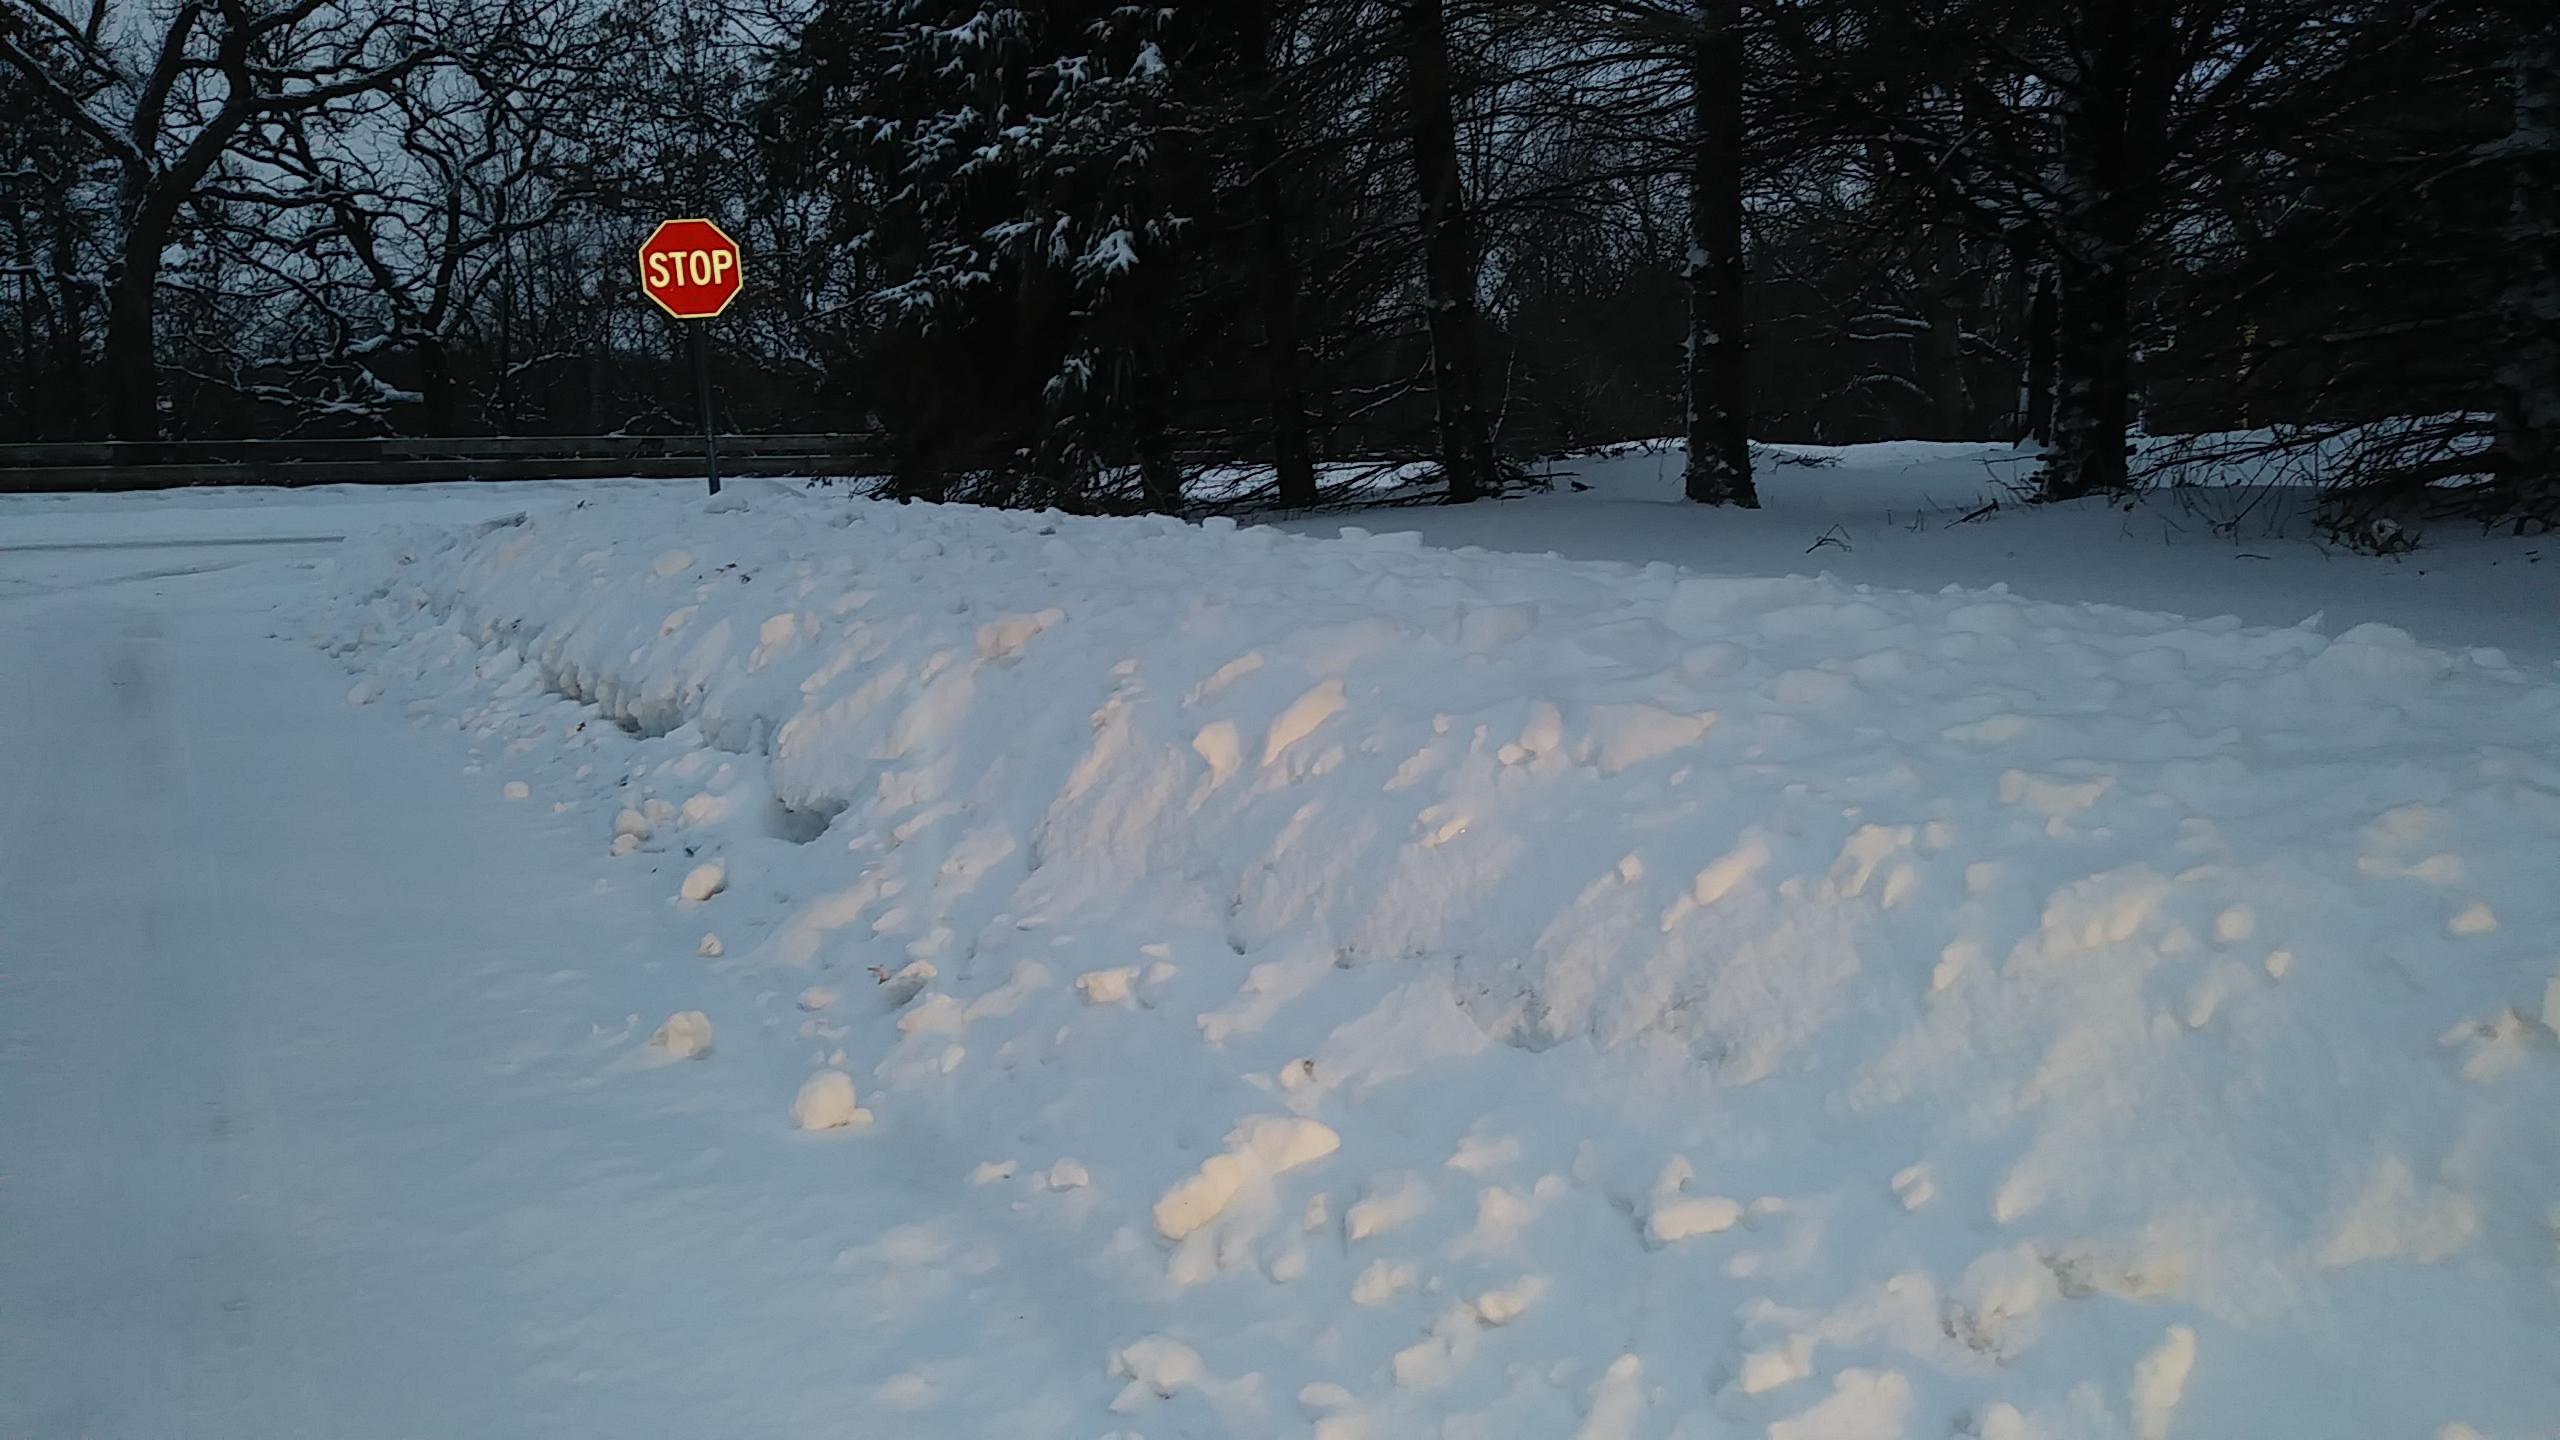 OVERNIGHT SNOW CAUSING SLIPPERY ROADS